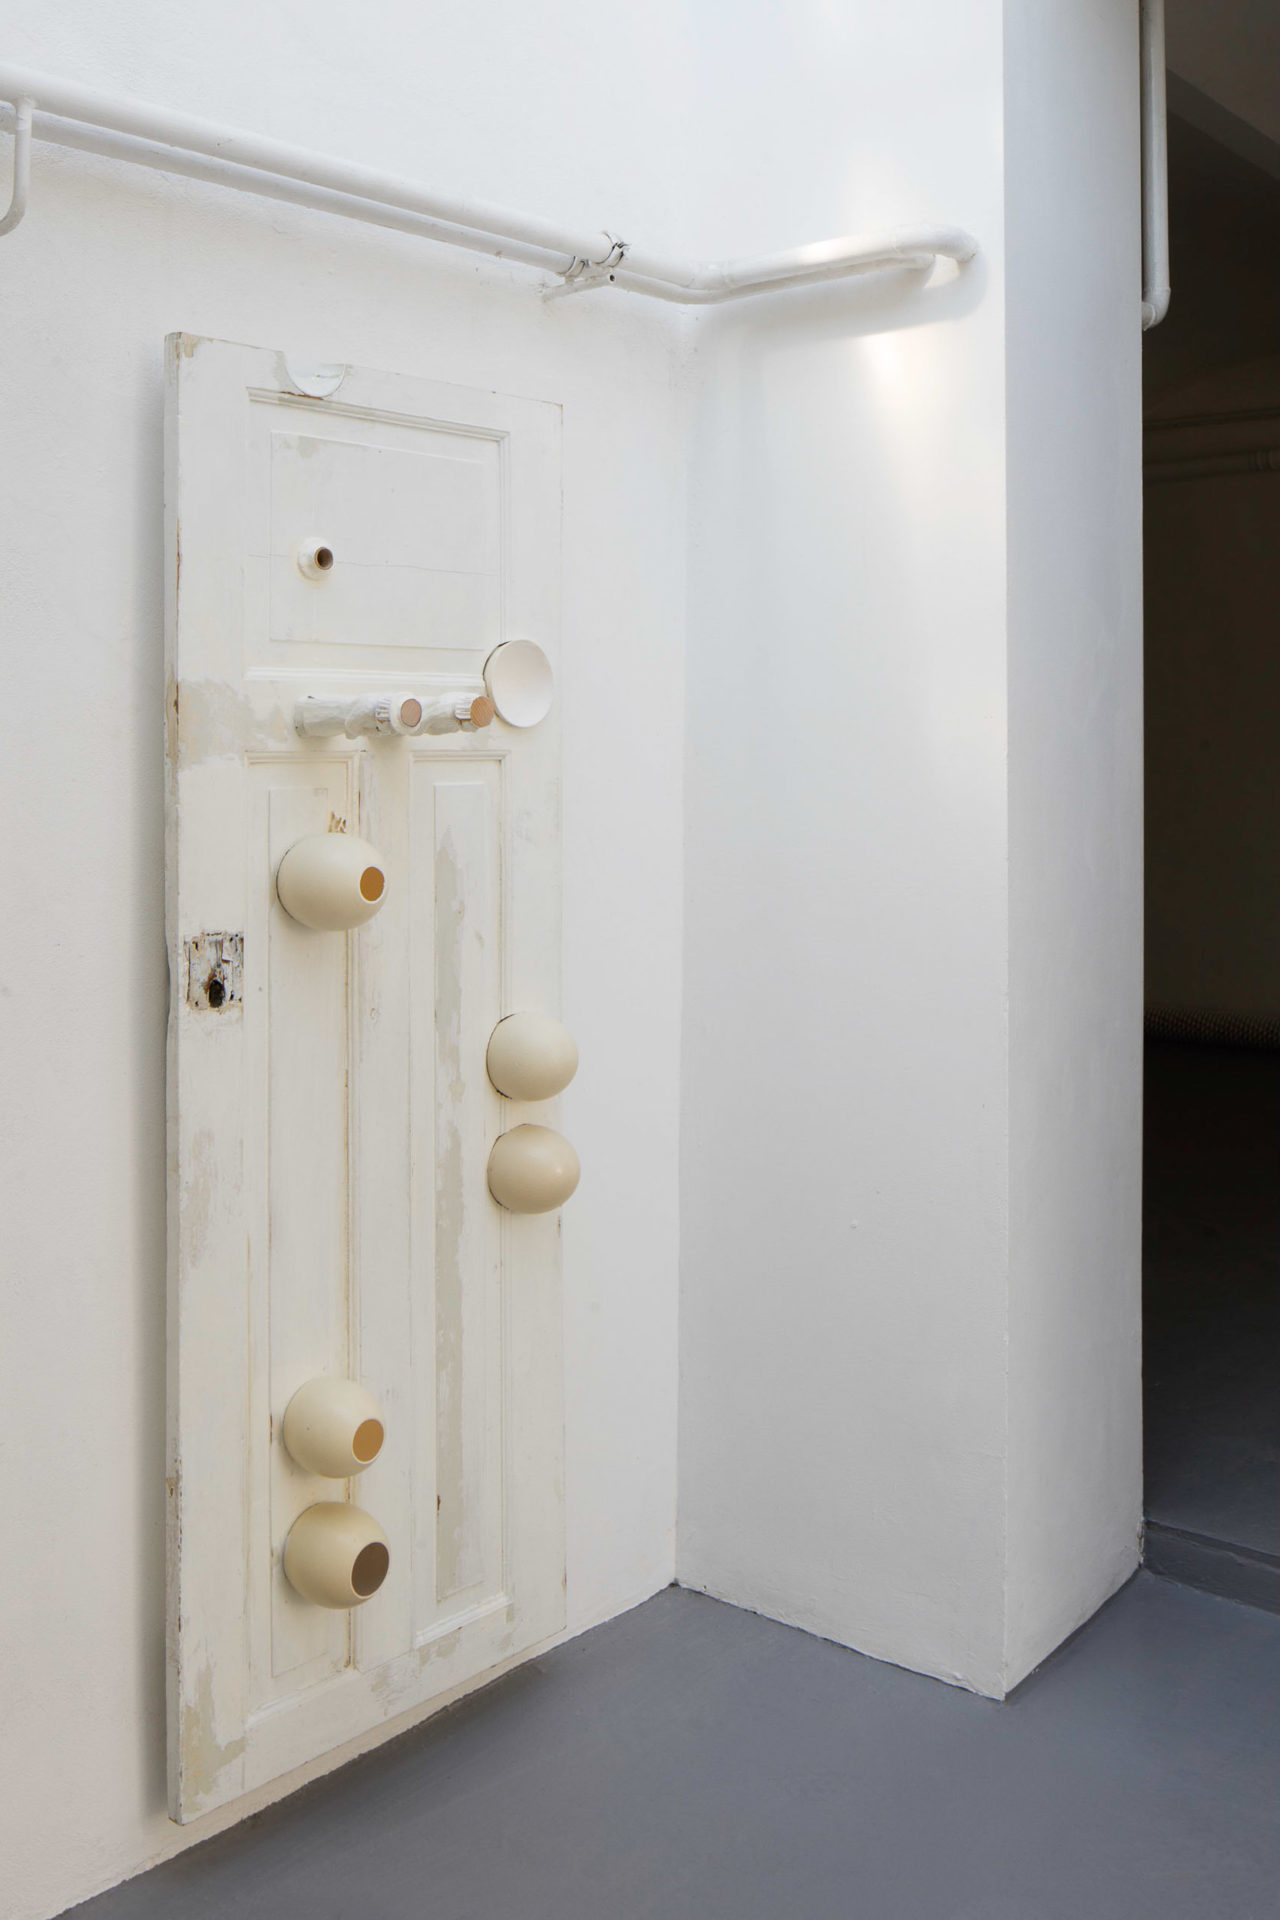 Piotr Łakomy, Neighbour Bathroom Door, 2019